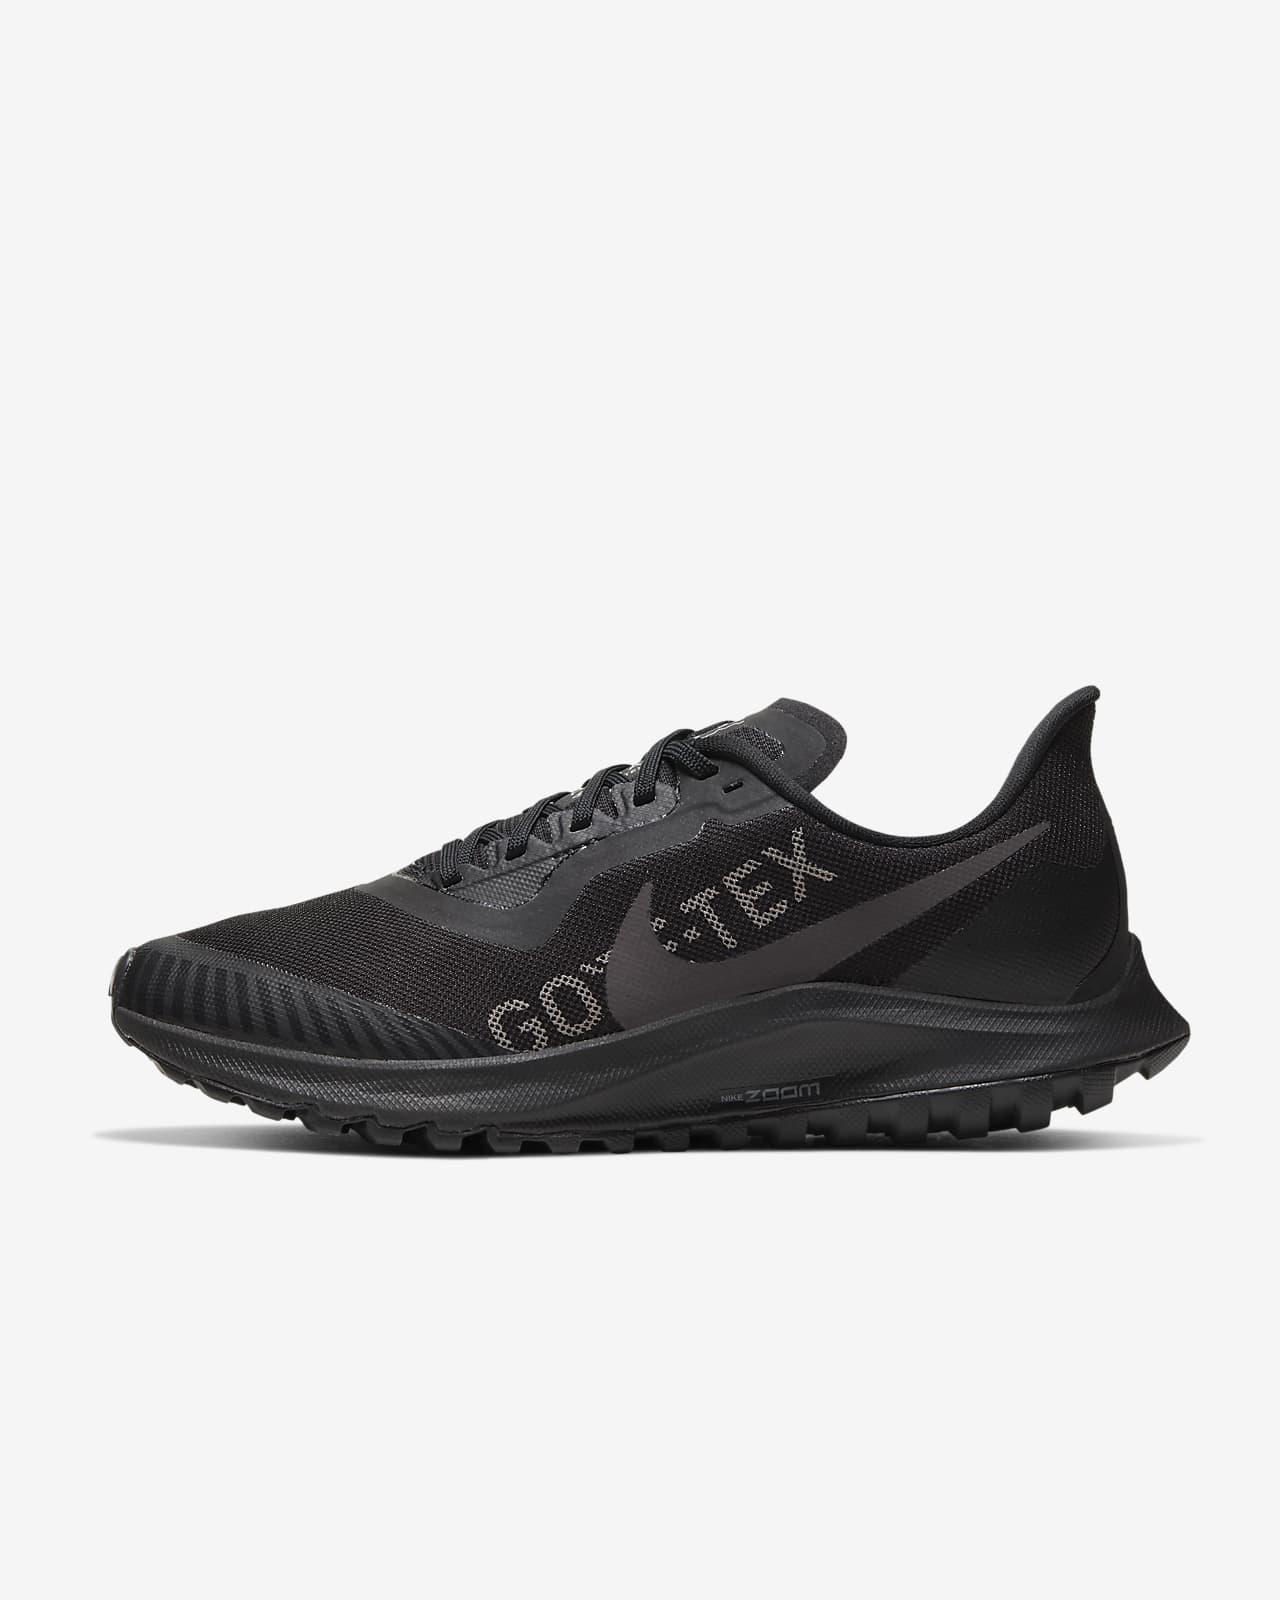 Nike Zoom Pegasus 36 Trail GORE-TEX Zapatillas de running para trail - Mujer